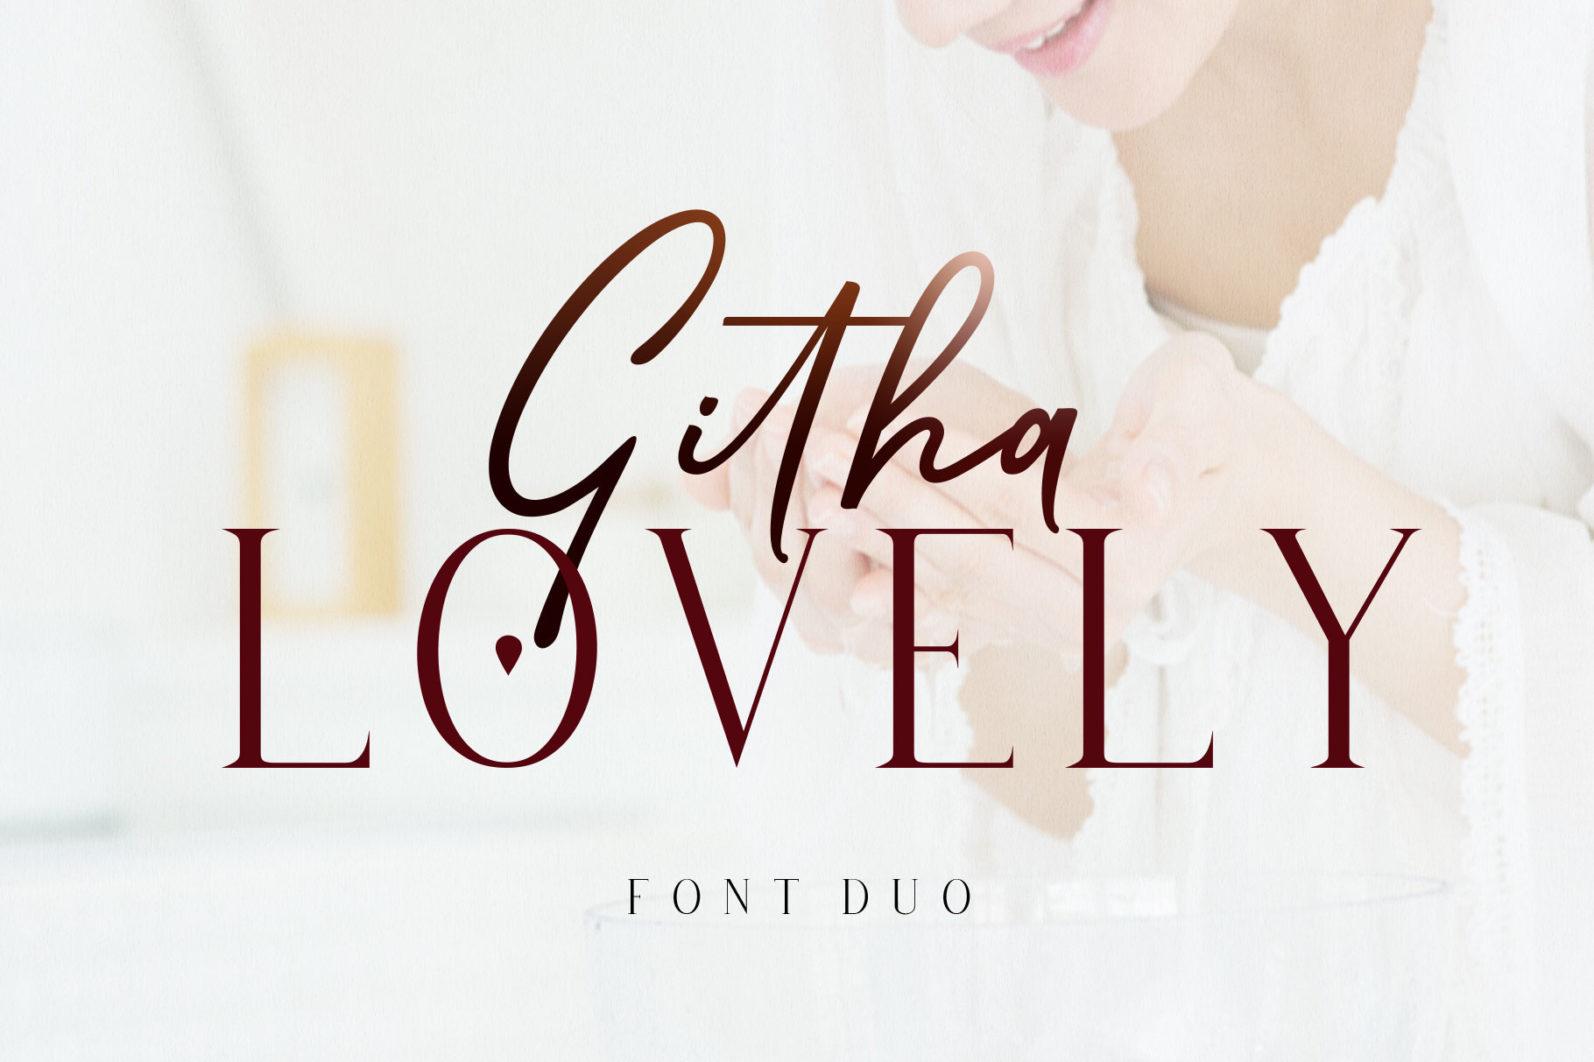 Githa Lovely Font Duo - Cover29 -